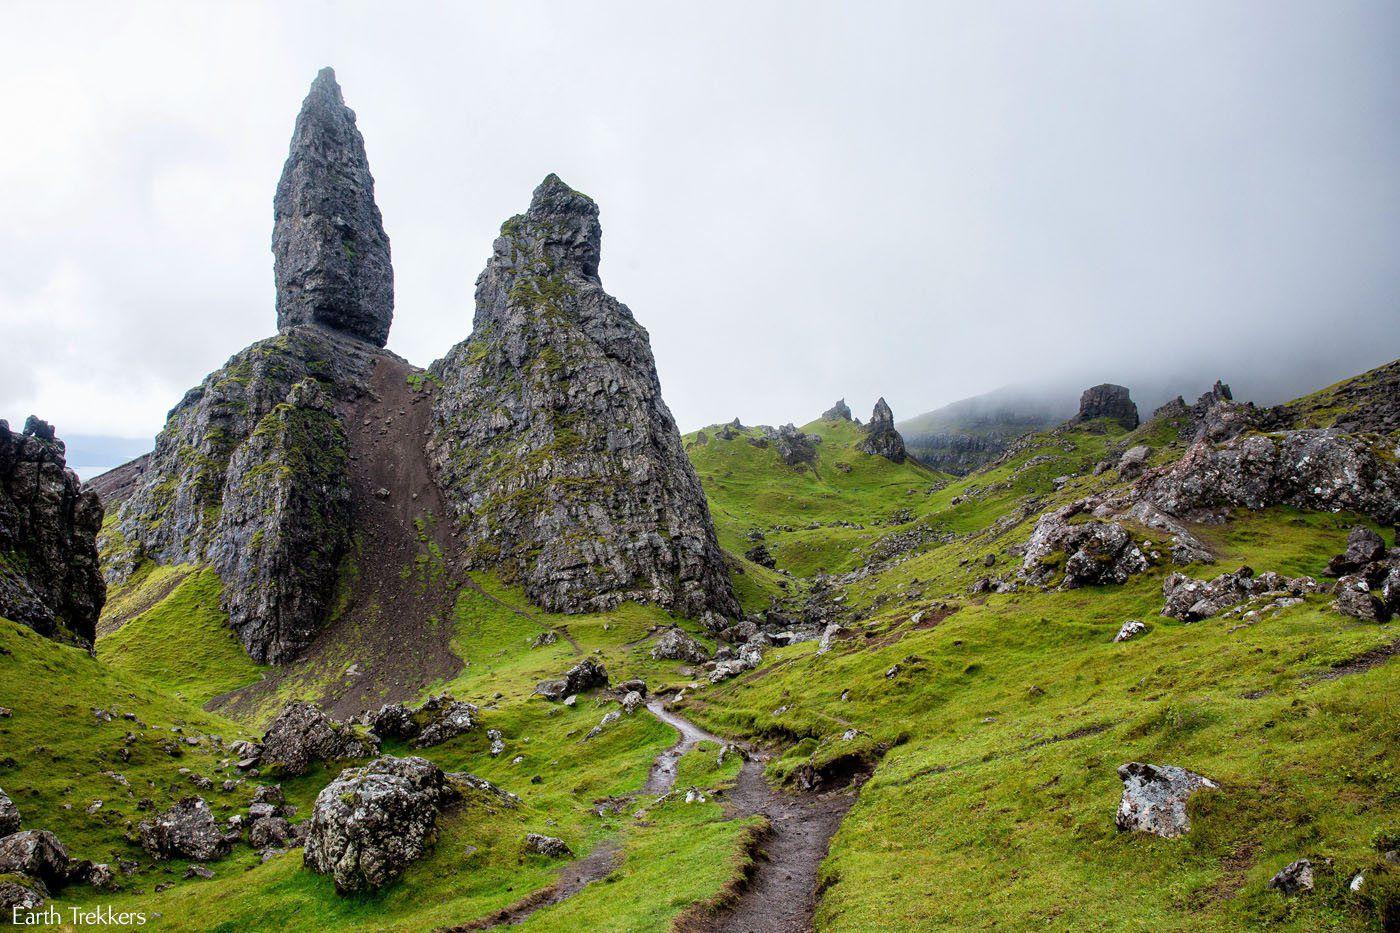 The Old Man Of Storr Isle Of Skye Scotland Earth Trekkers